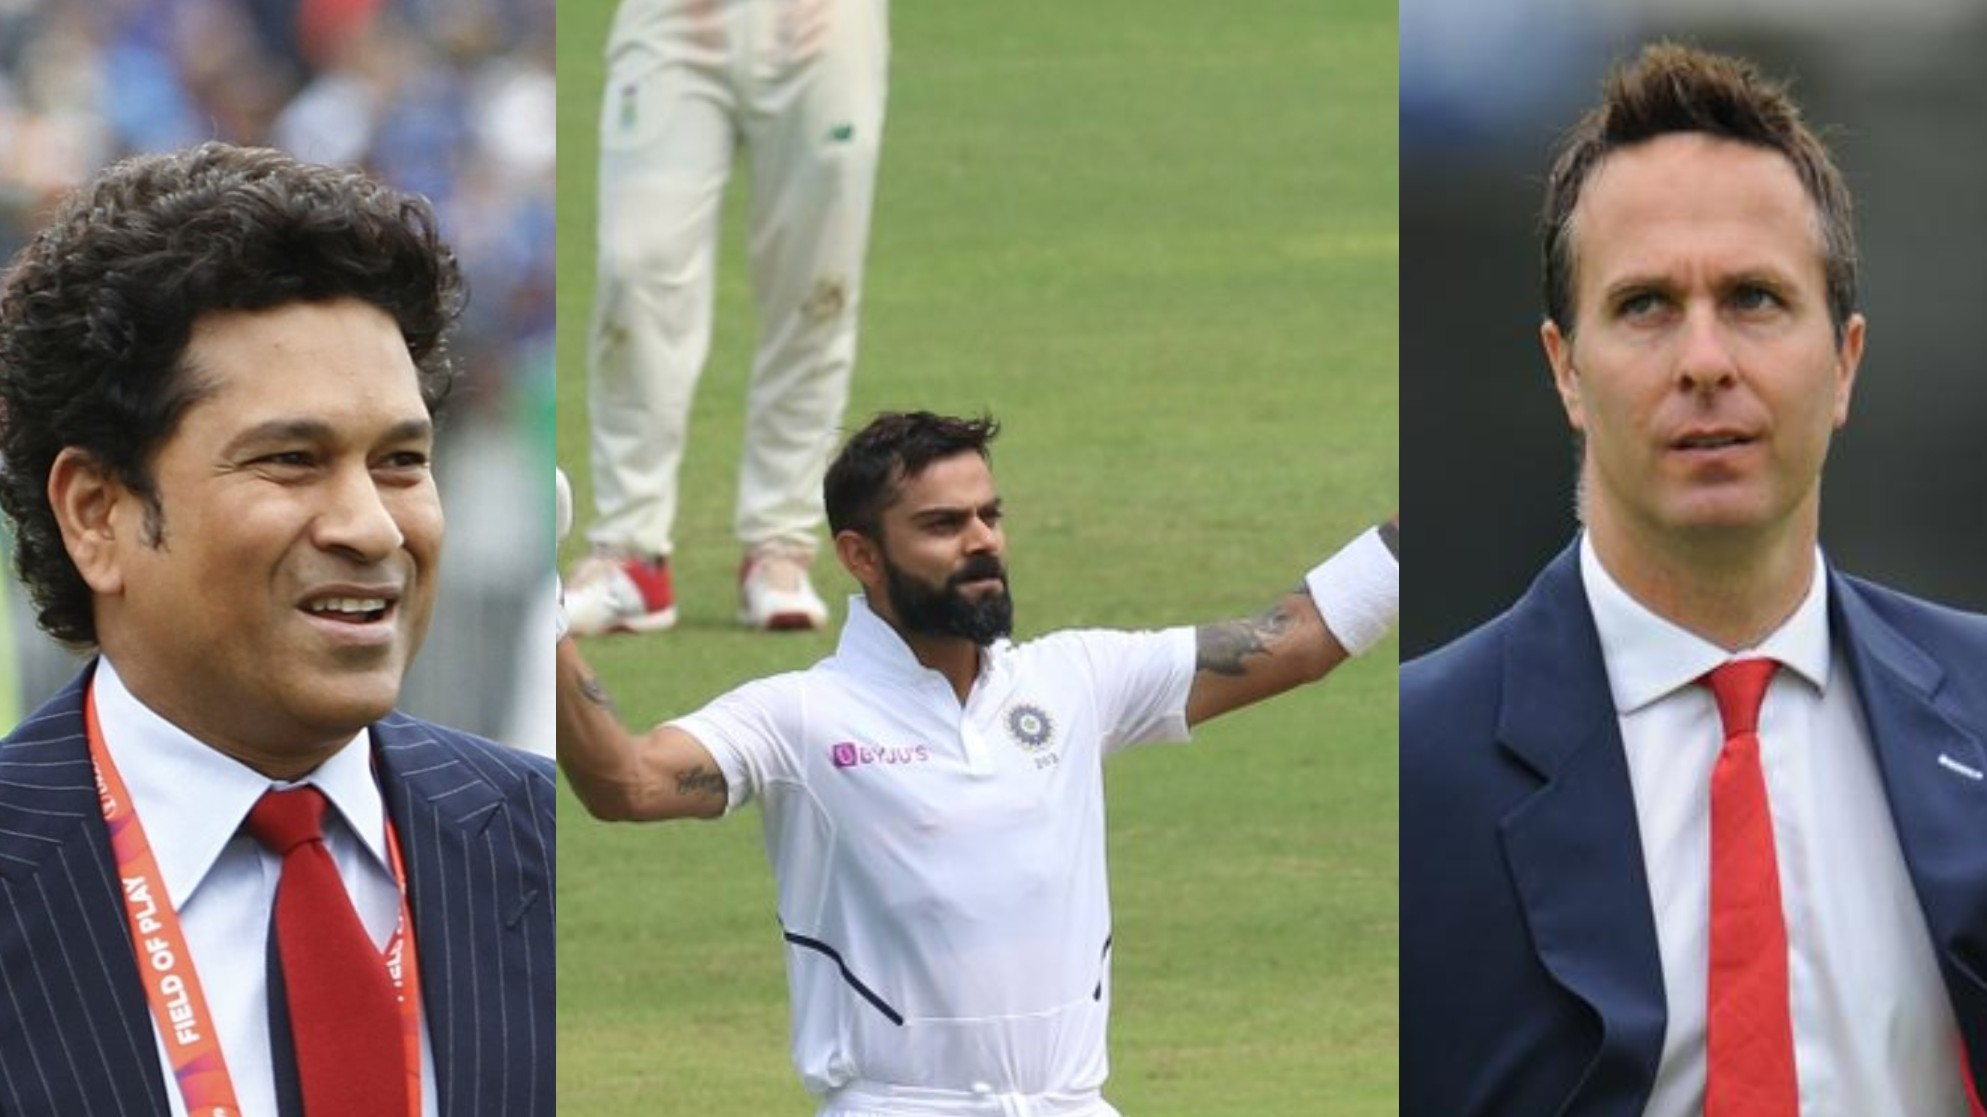 IND v SA 2019:Cricket fraternity lauds Virat Kohli's amazing 254*; India declares on 601/5